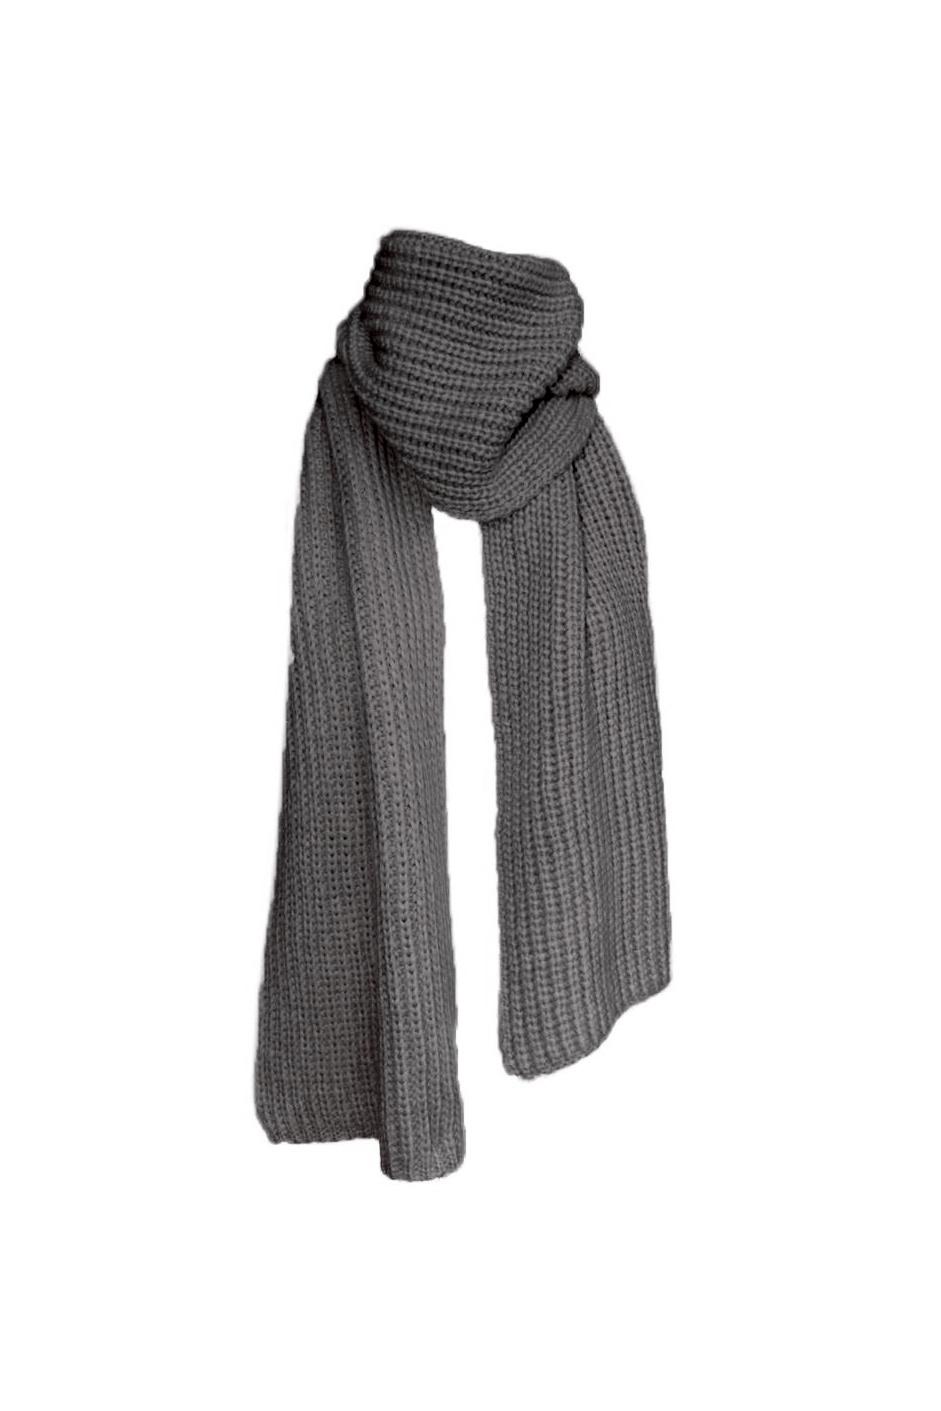 December Scarf - Dark Melange Grey-2